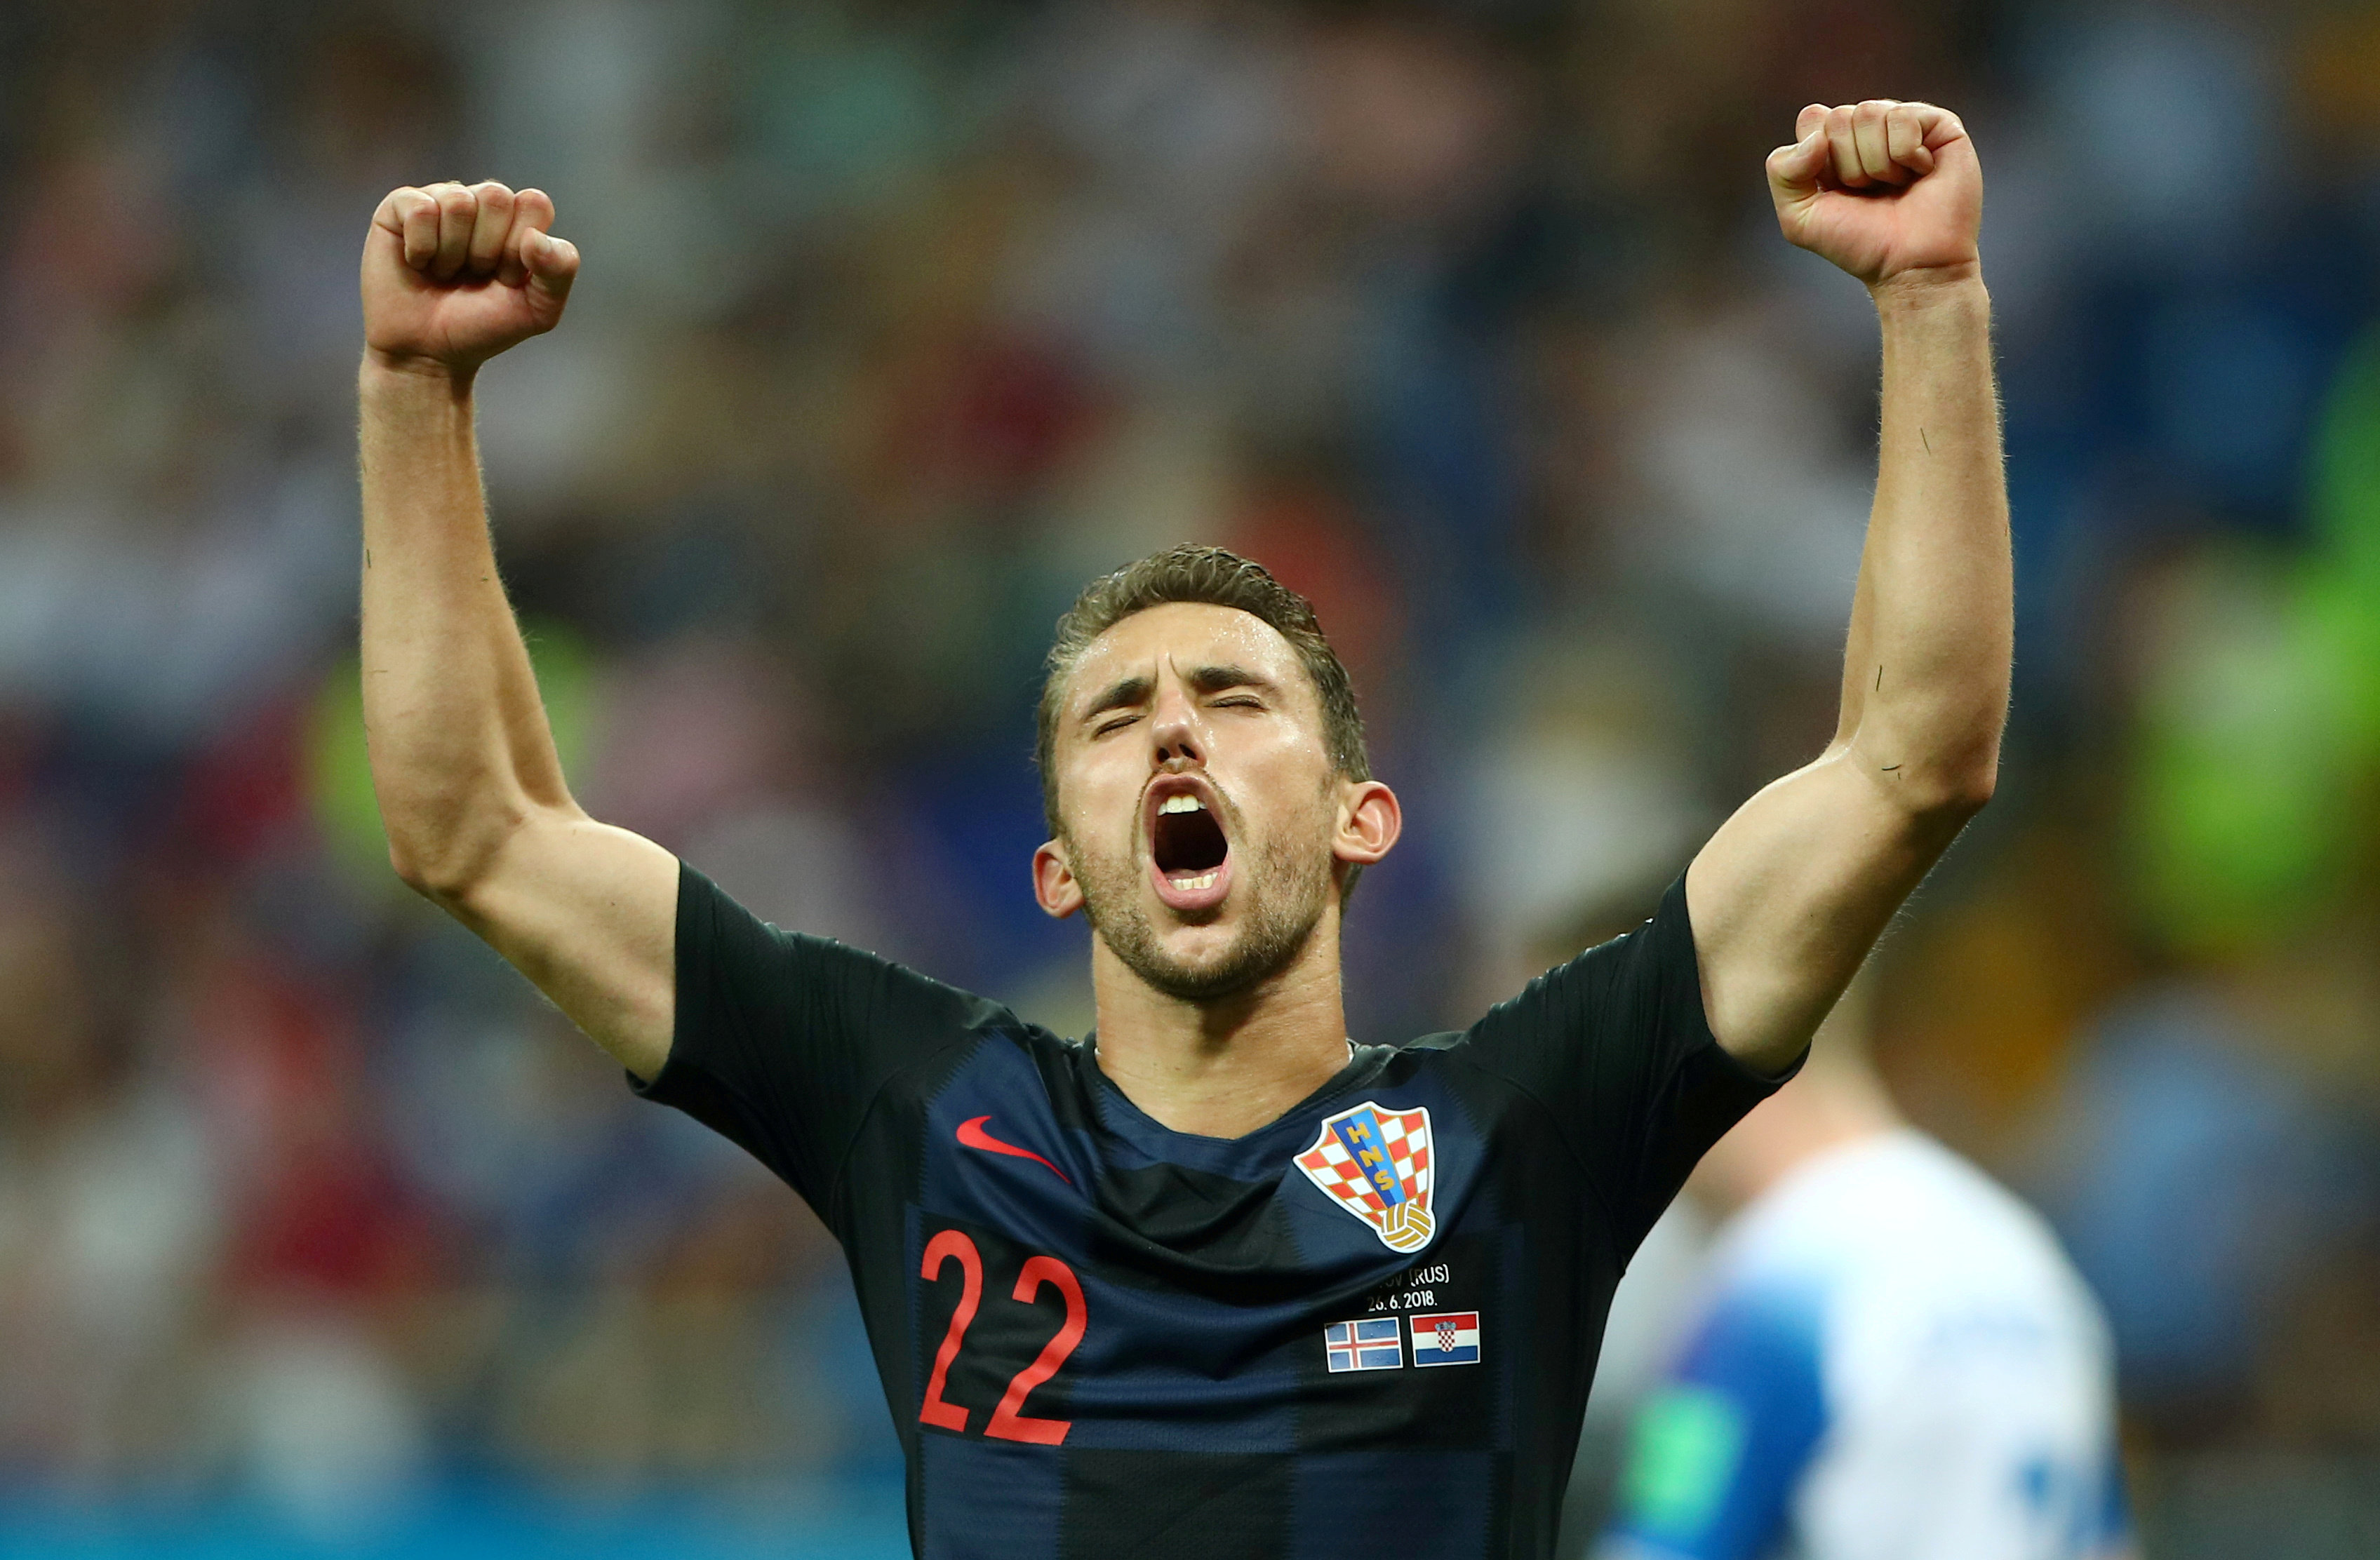 Football: Croatia on course to rival stunning run of '98